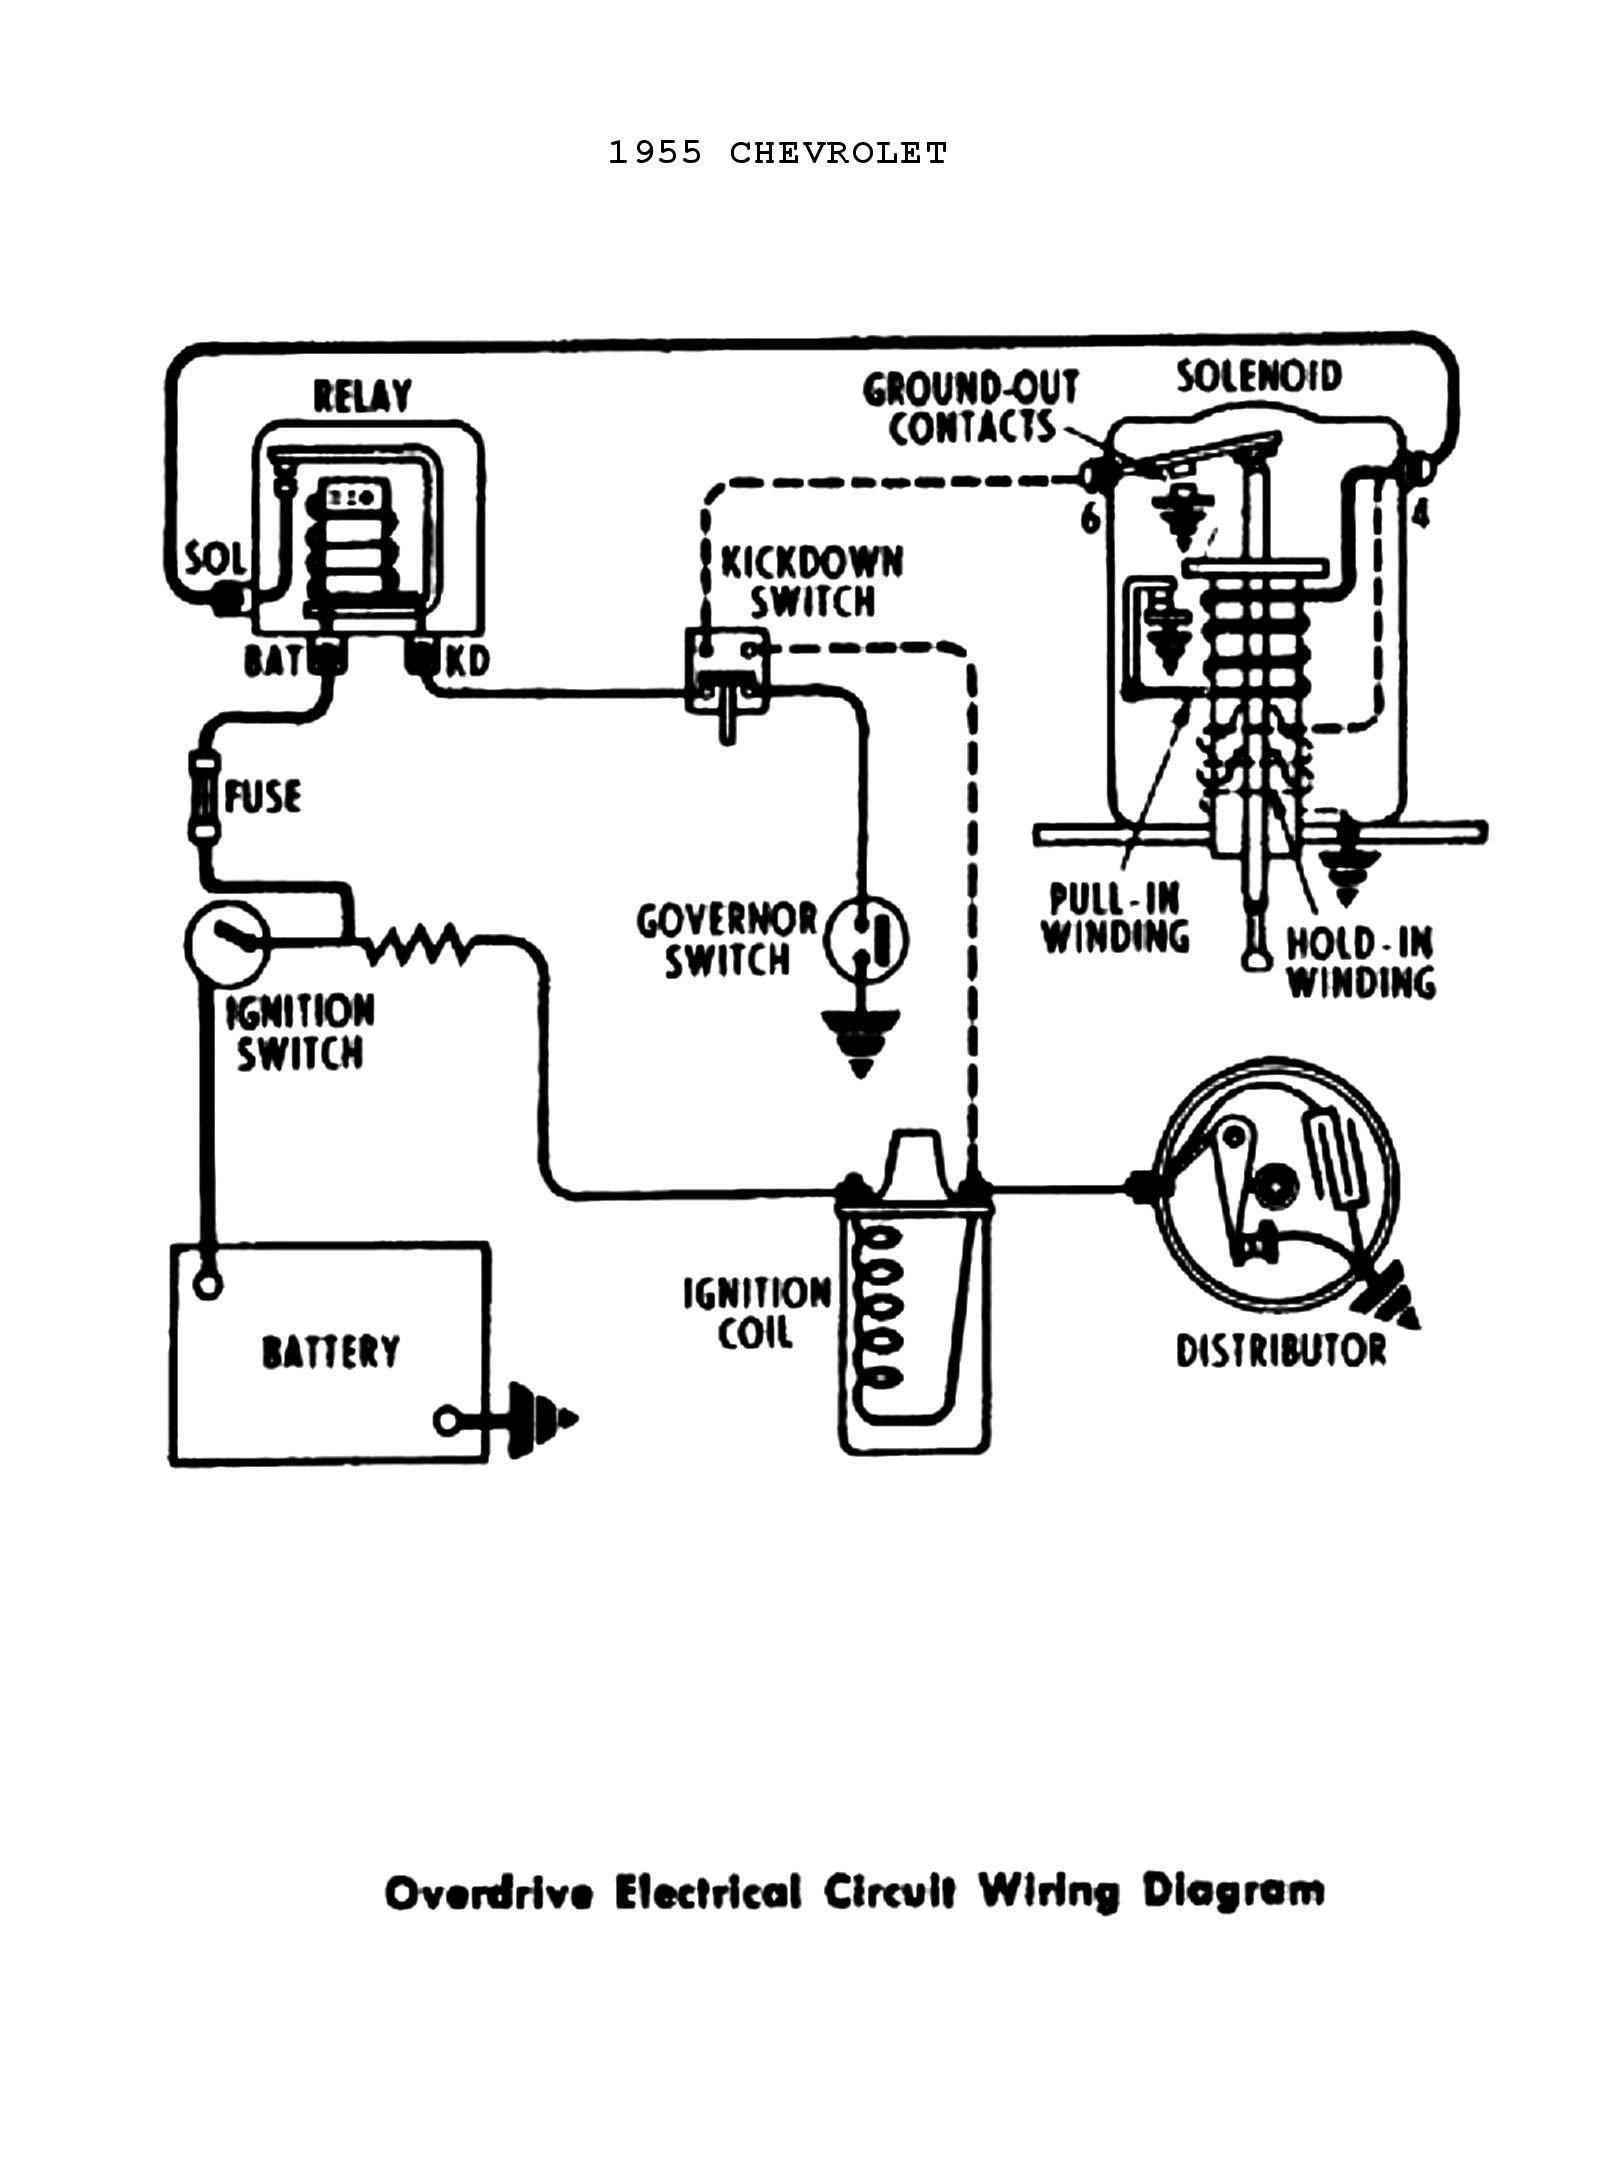 Farmall a wiring diagram overdrive transmission wiring diagram 1965 vw van wiring diagram of farmall a